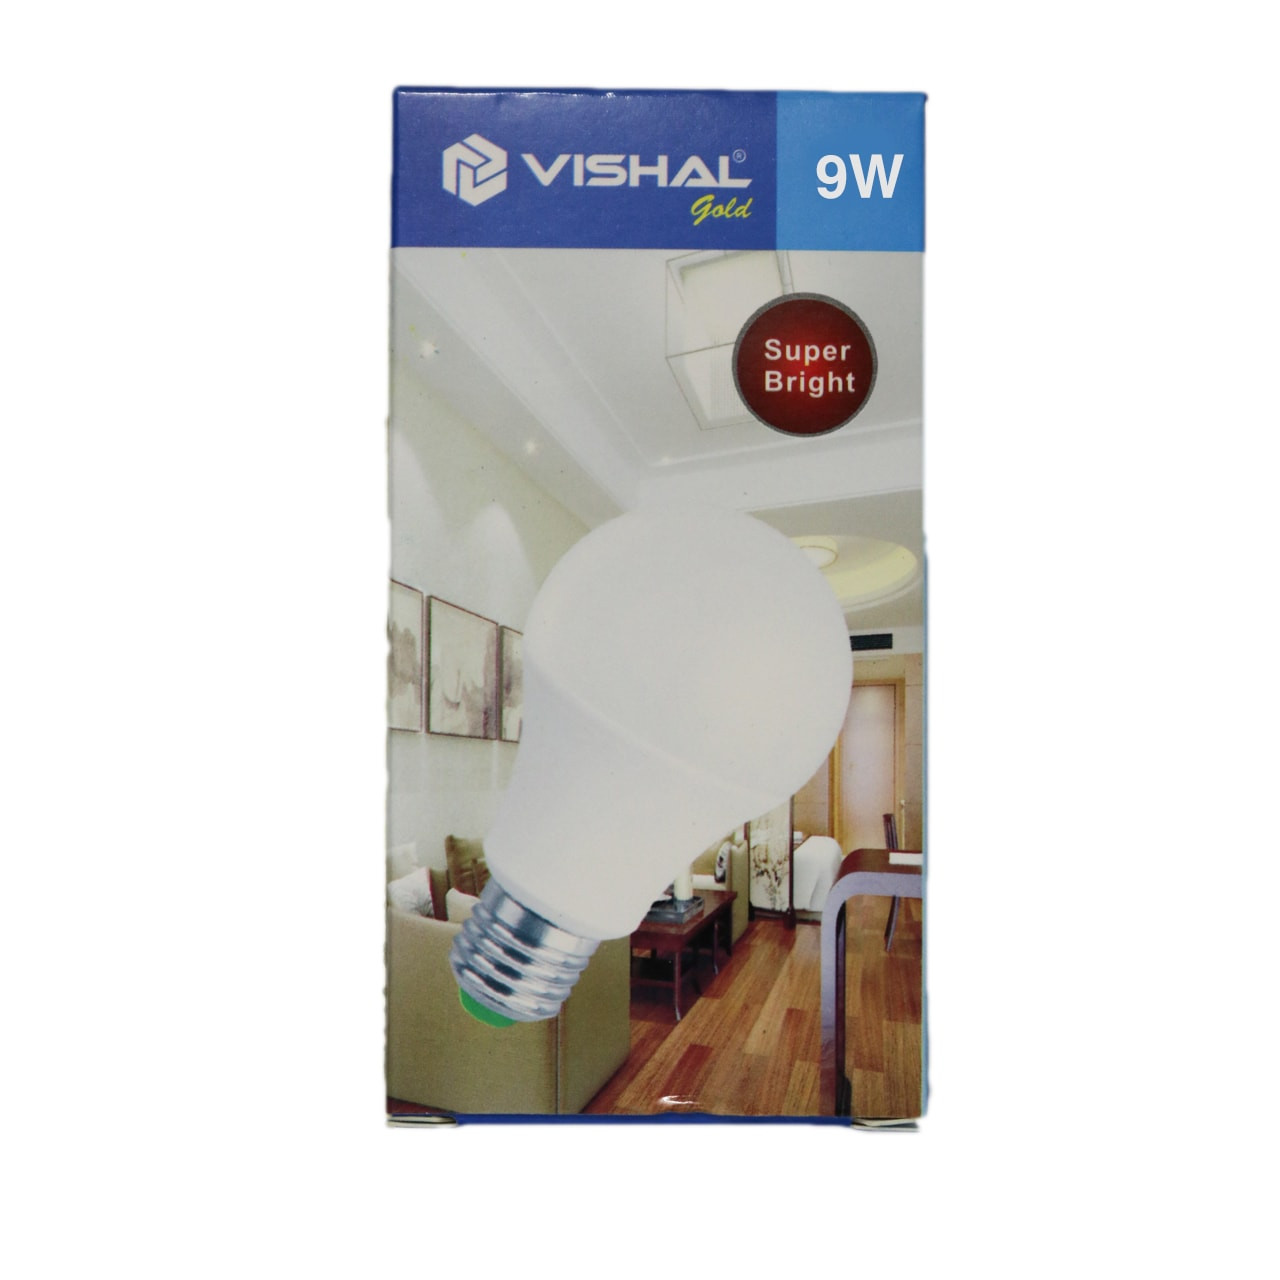 9 Watt Vishal Bulb (e27)